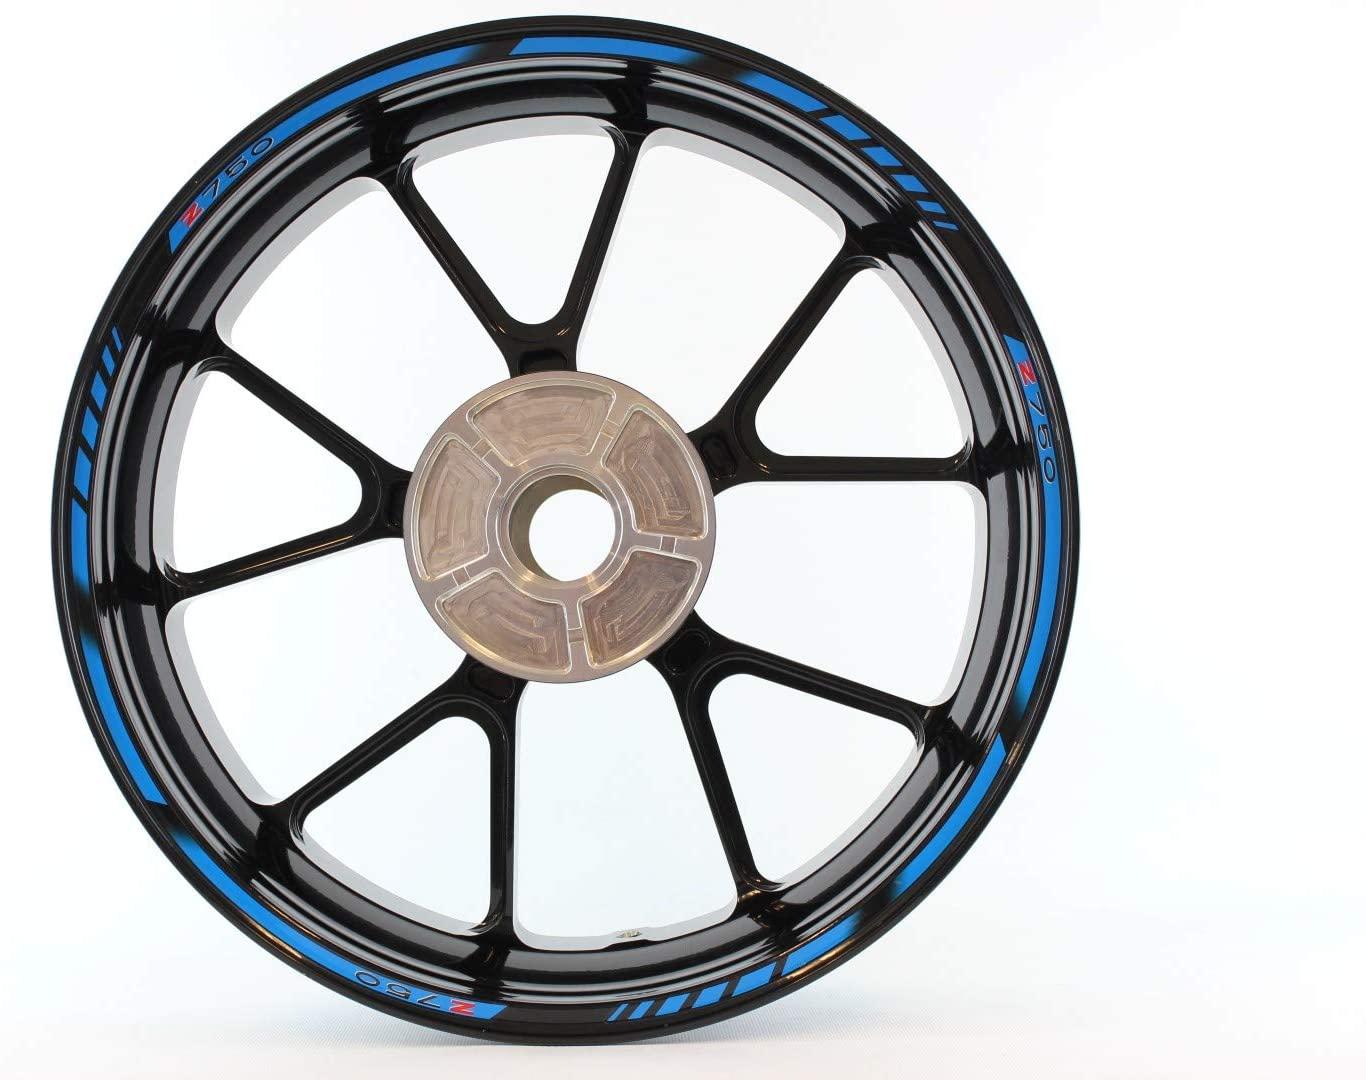 Motorcycle wheel rim decals rimstriping strips accessory sticker for Kawasaki Z750 Z 750 (Light Blue)